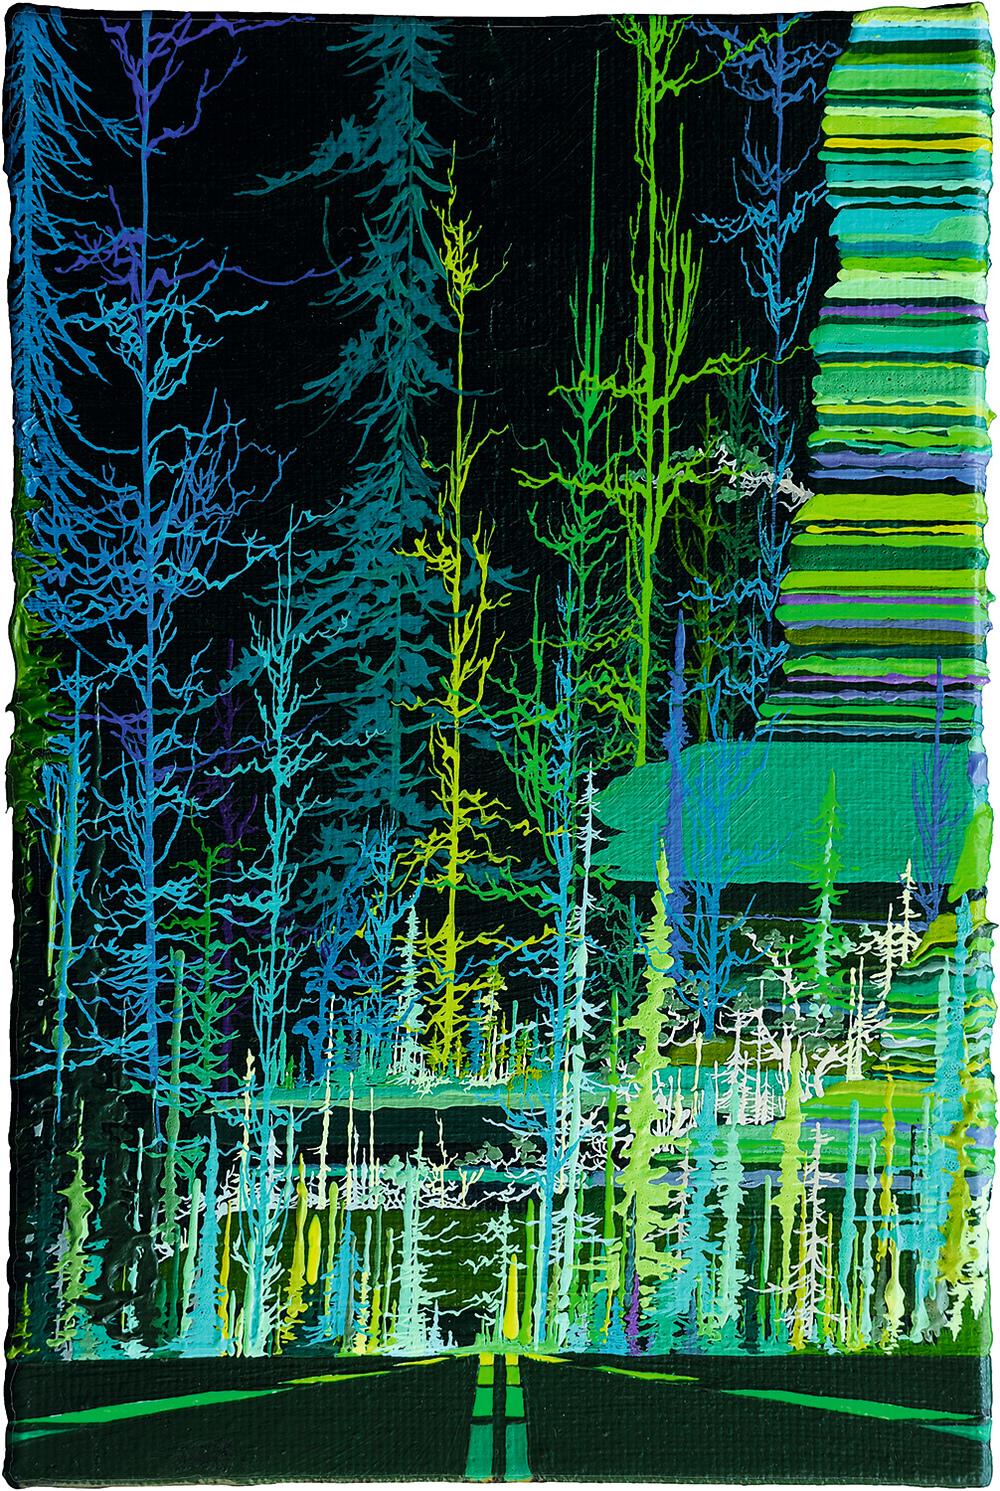 Zhou Fan 周范, Landscape 05:18 风景 05:18, 2015, Acrylic on canvas 布面丙烯, 30 x 20 cm